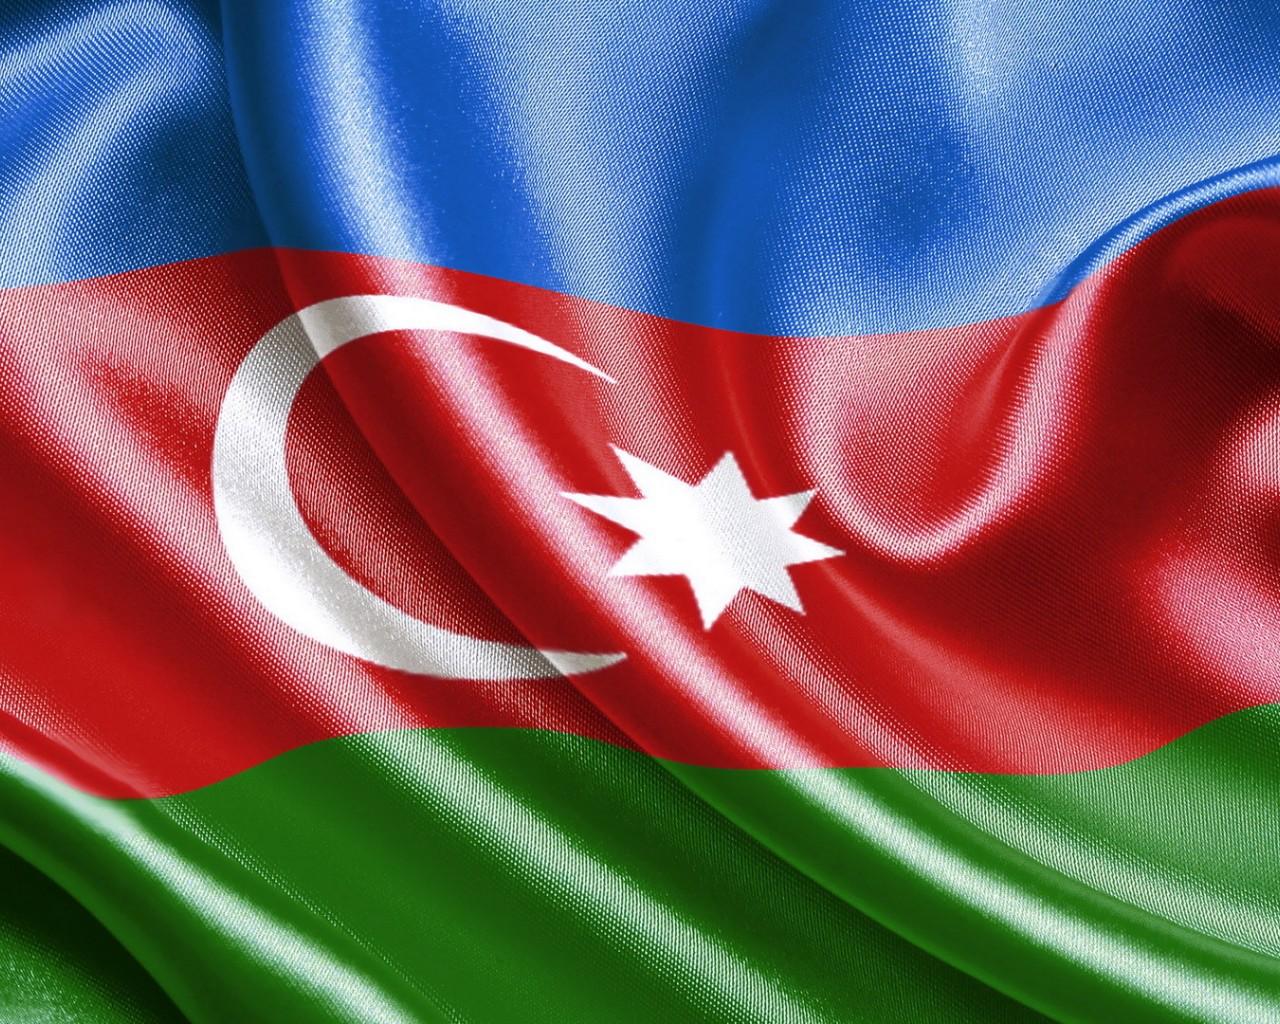 Азербайджан, Azerbaijan - обои на рабочий ...: www.mobilmusic.ru/wallpaper.php?id=1164905